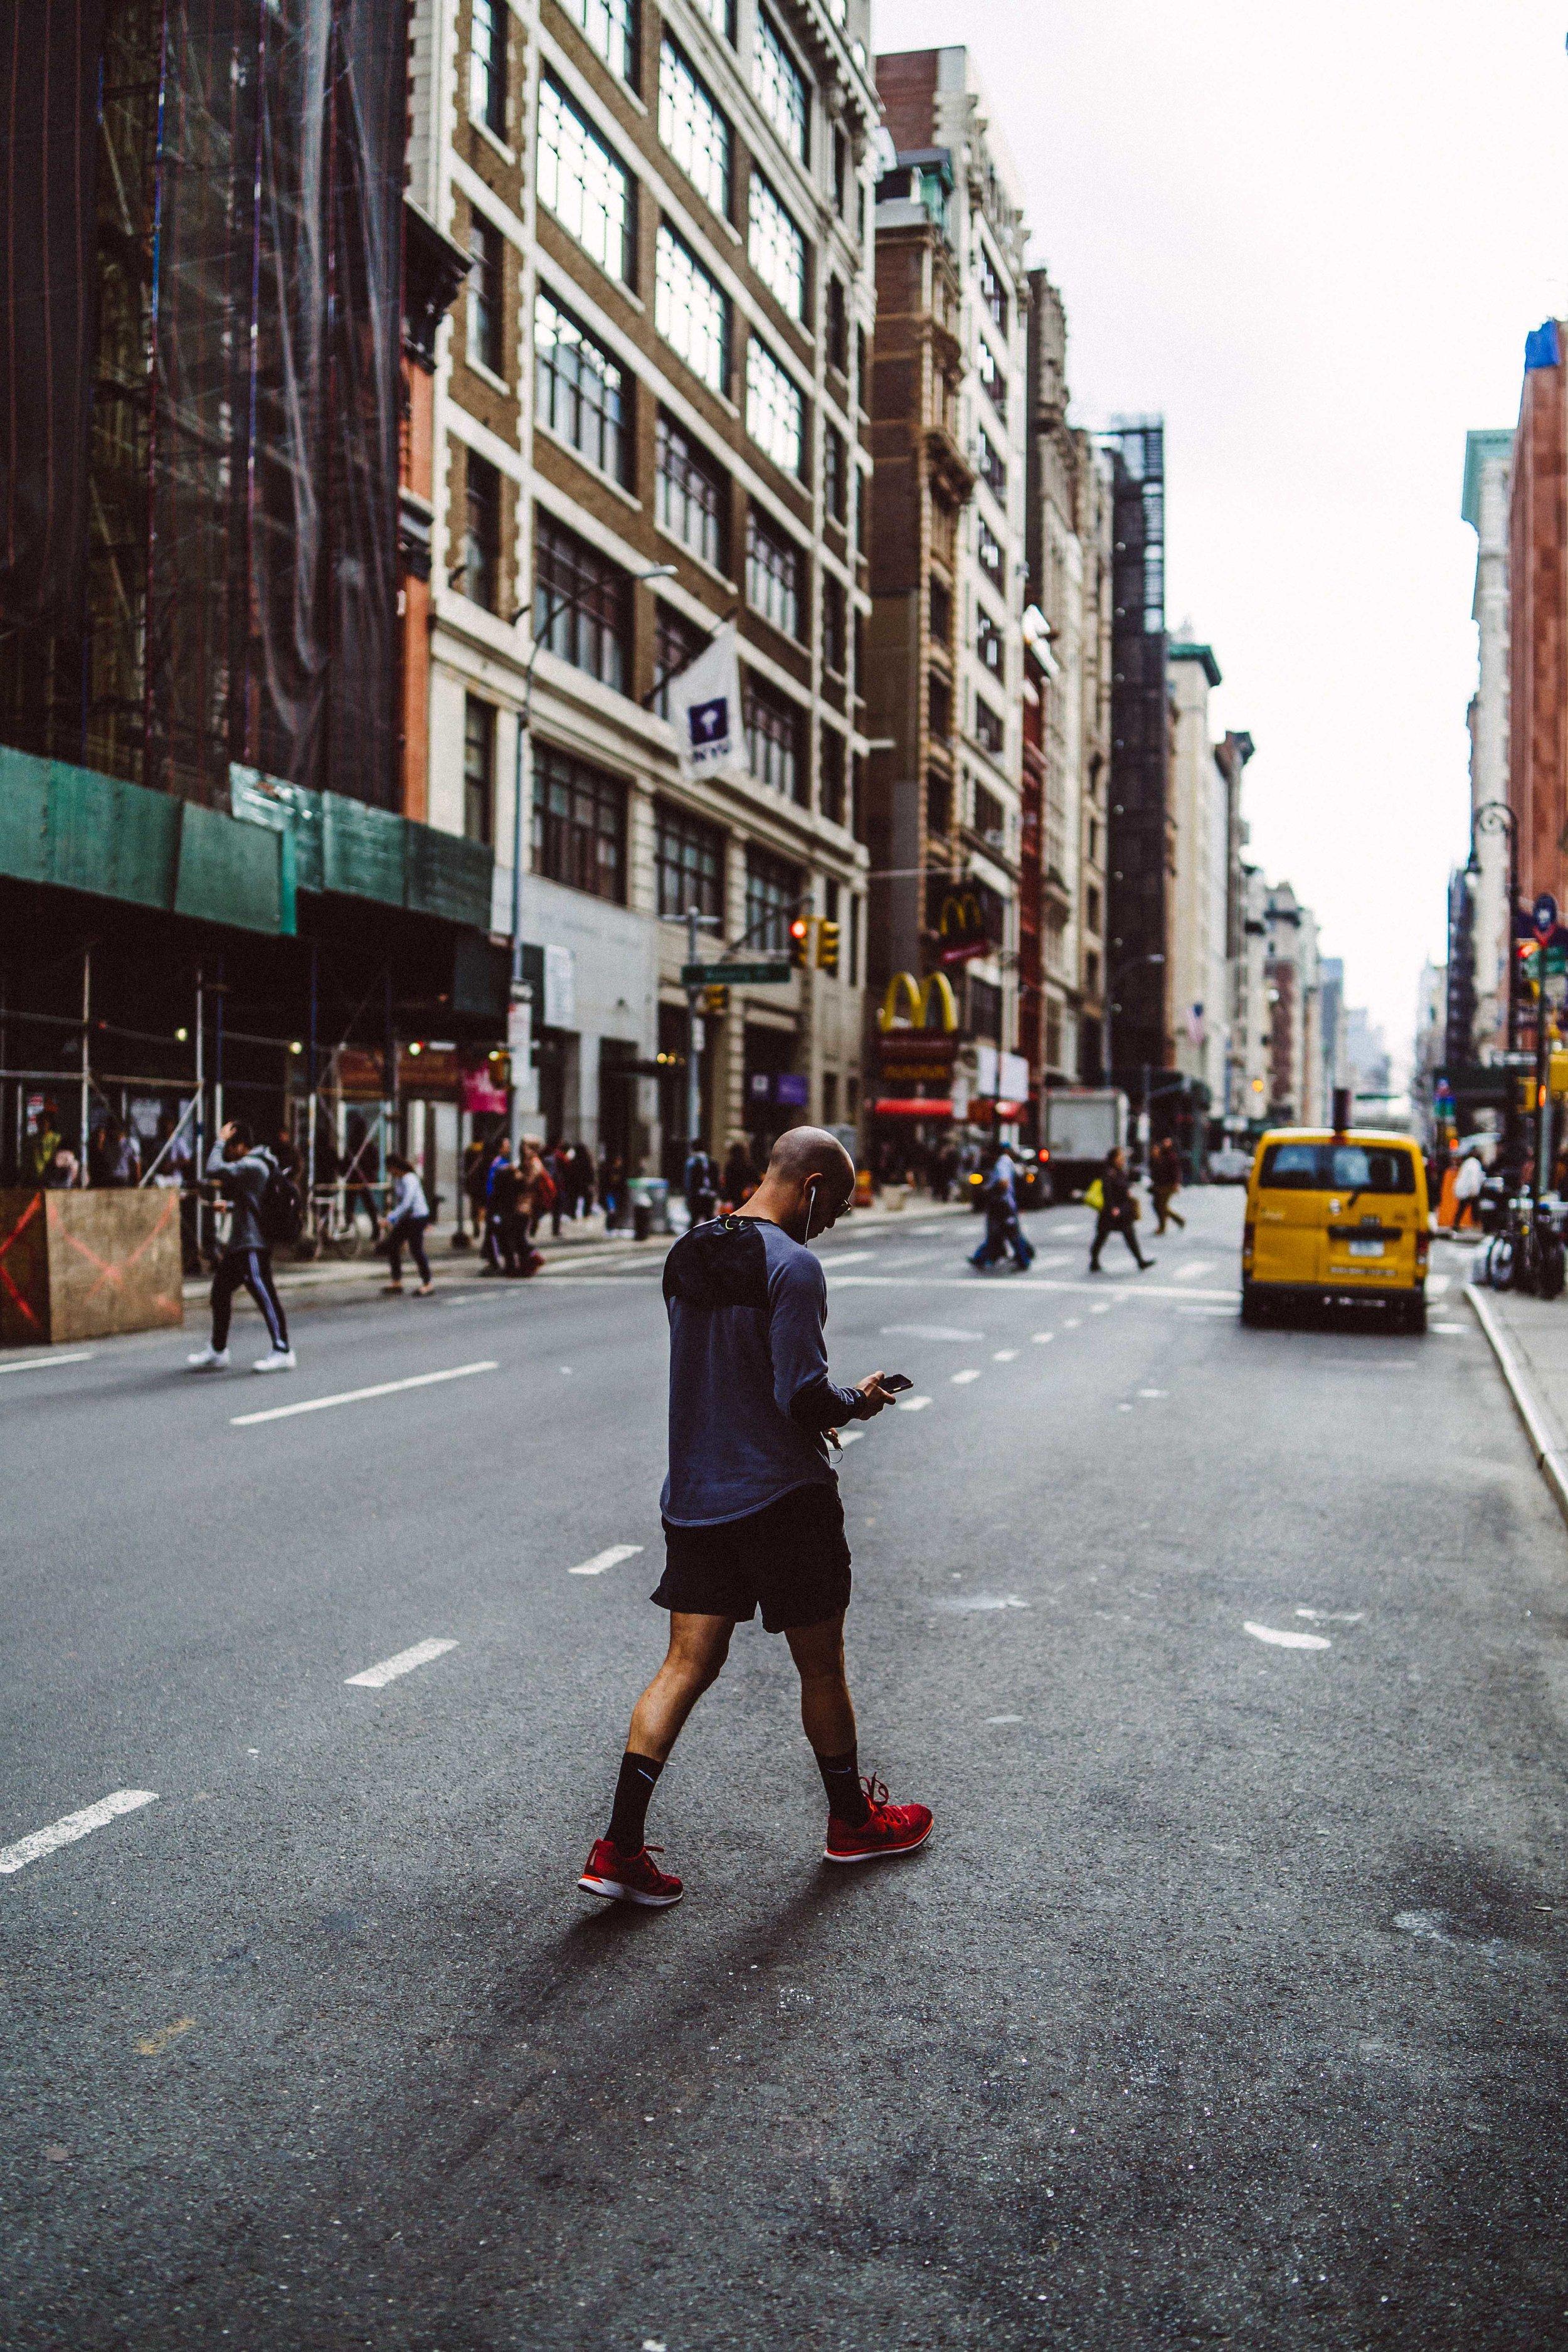 newyork-sony-102622.jpg